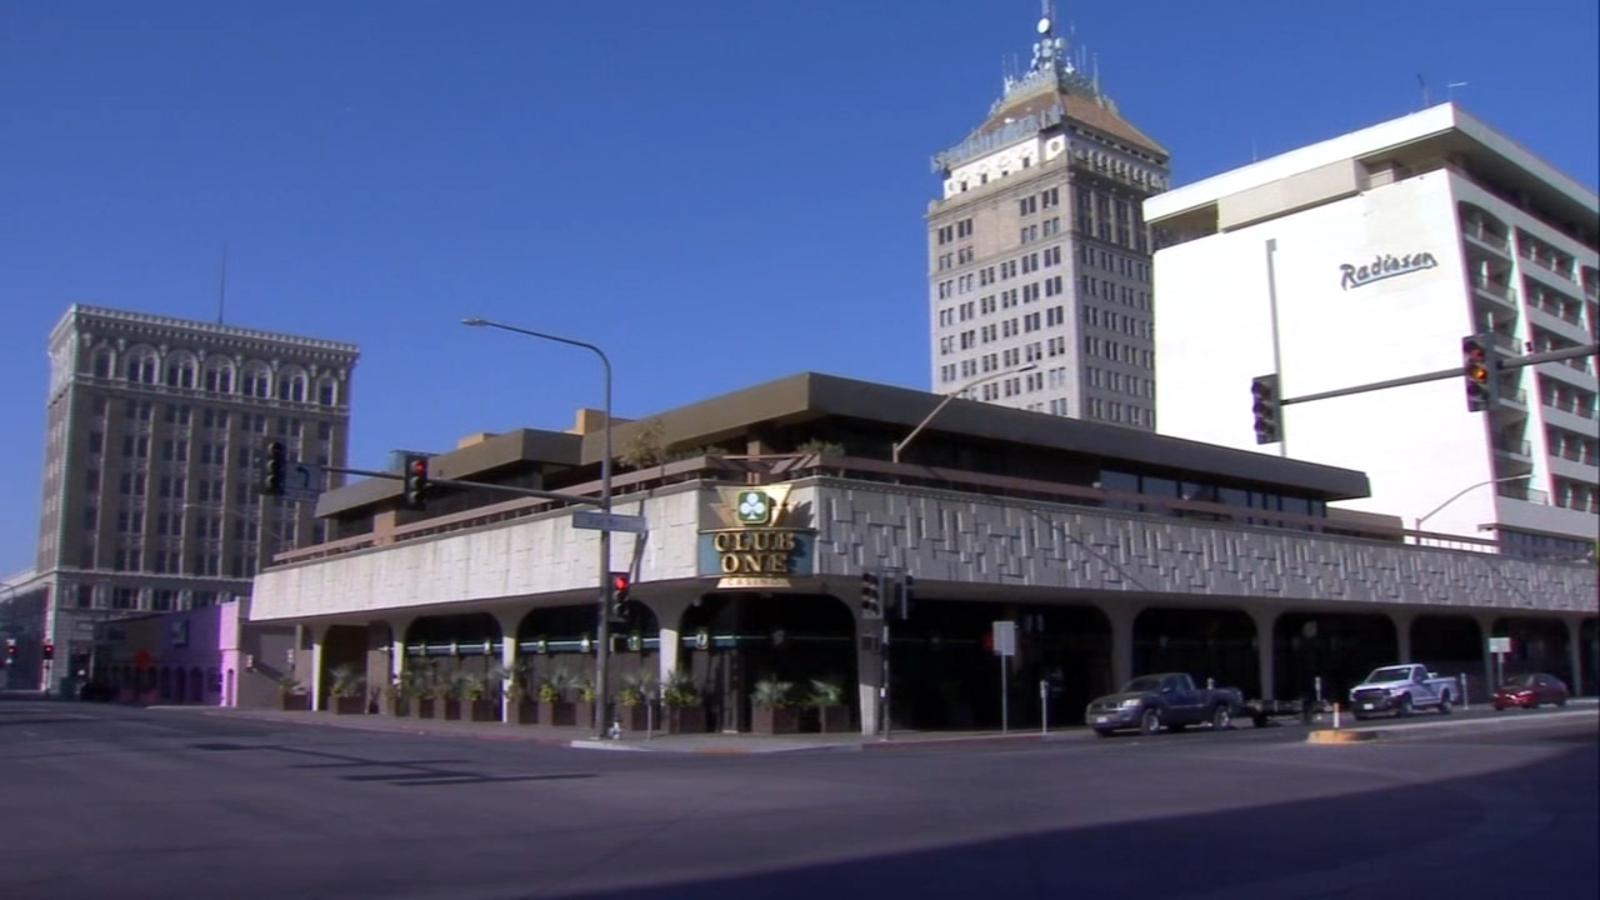 Club One Casino Fresno